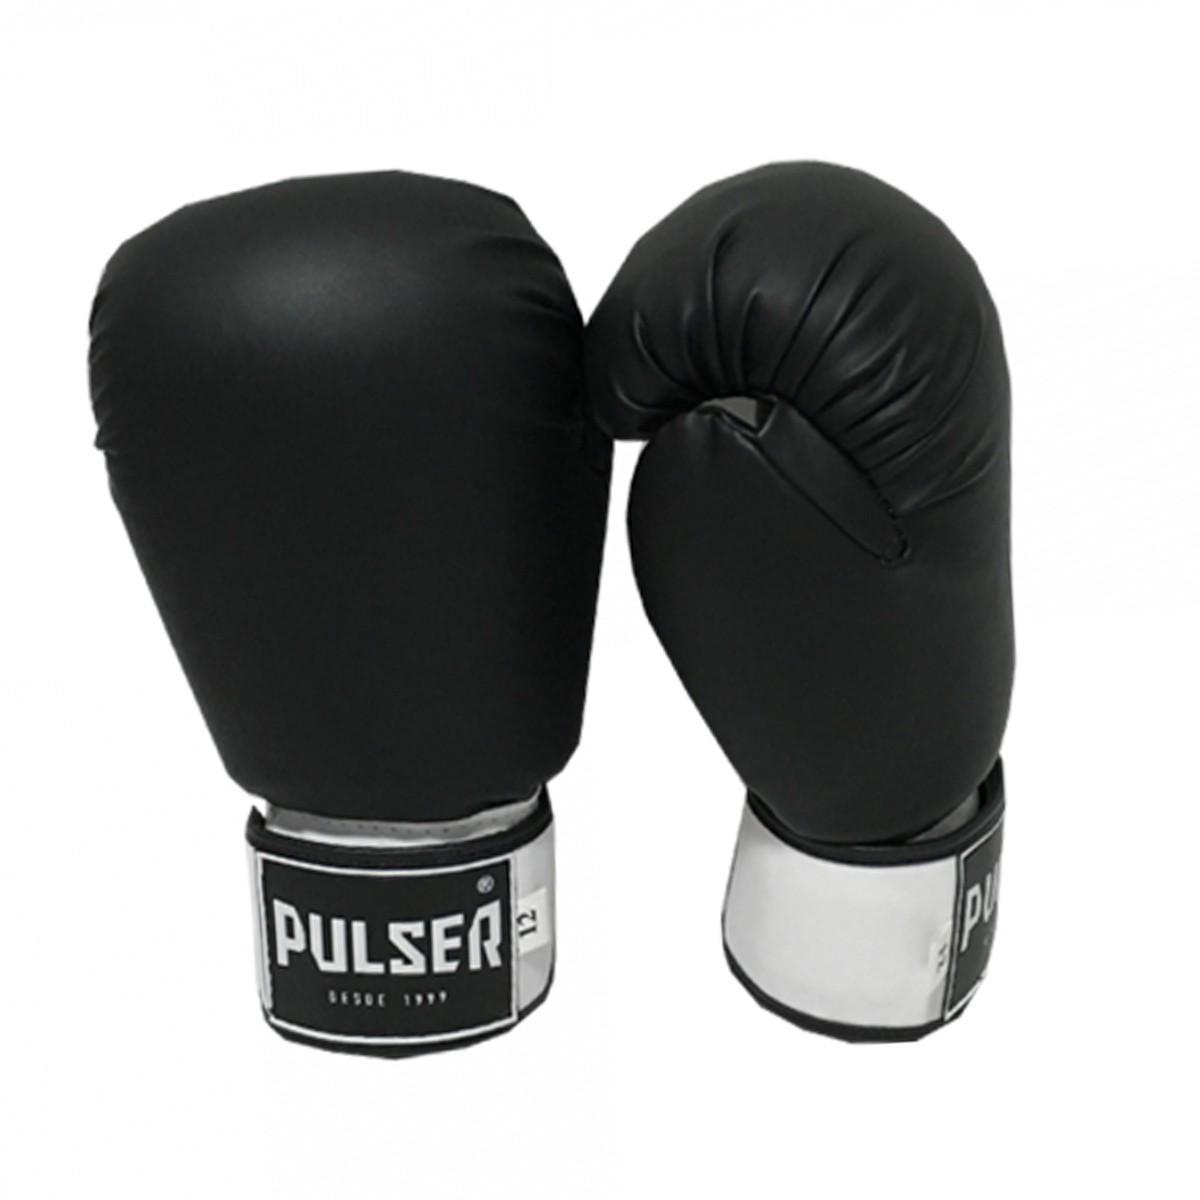 Kit de Muay Thai / Kickboxing 14oz - Preto - Pulser  - PRALUTA SHOP